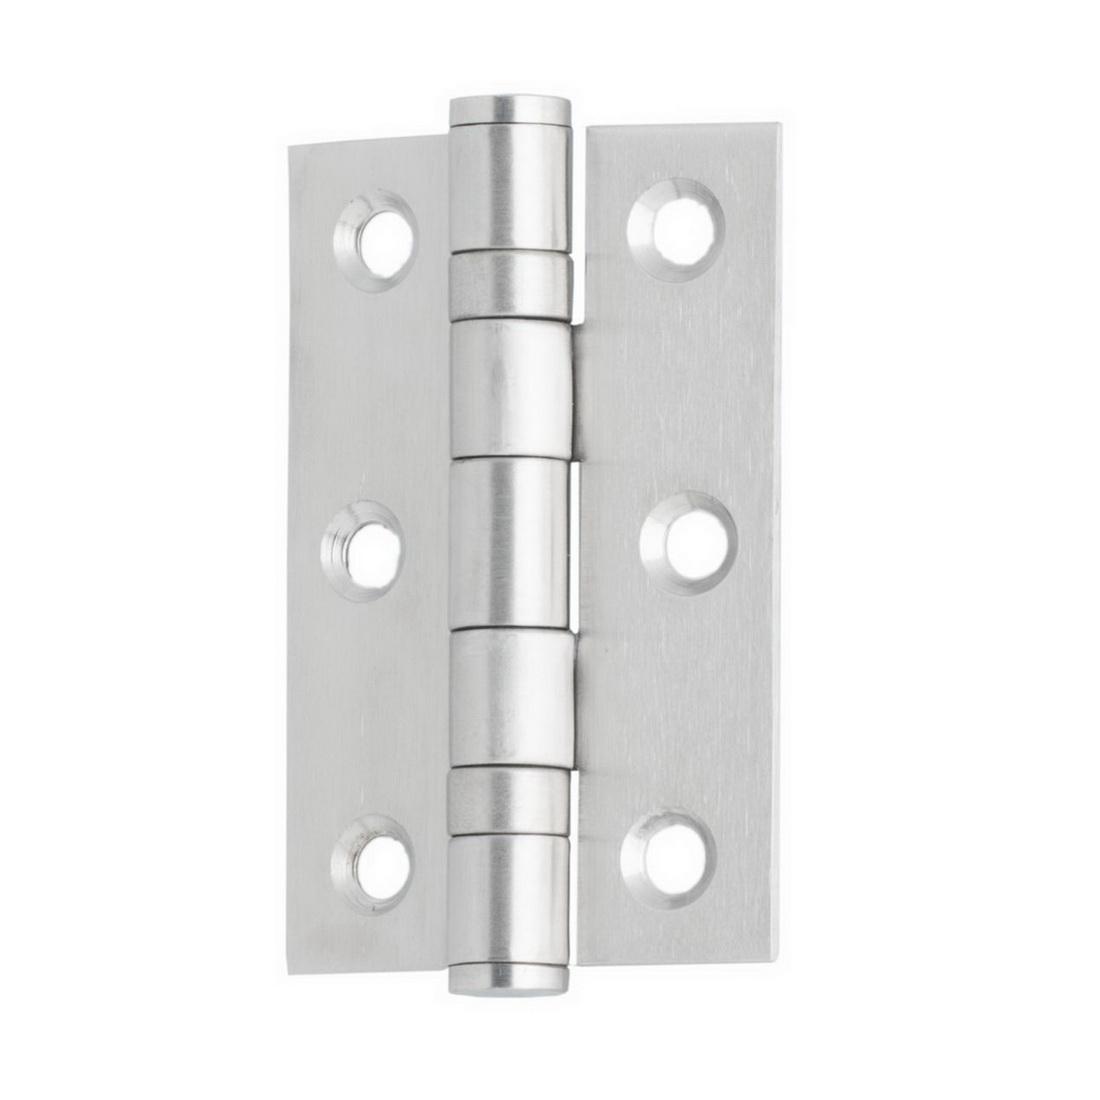 Square Edge Door Hinge 75 x 50 x 2mm 316SS